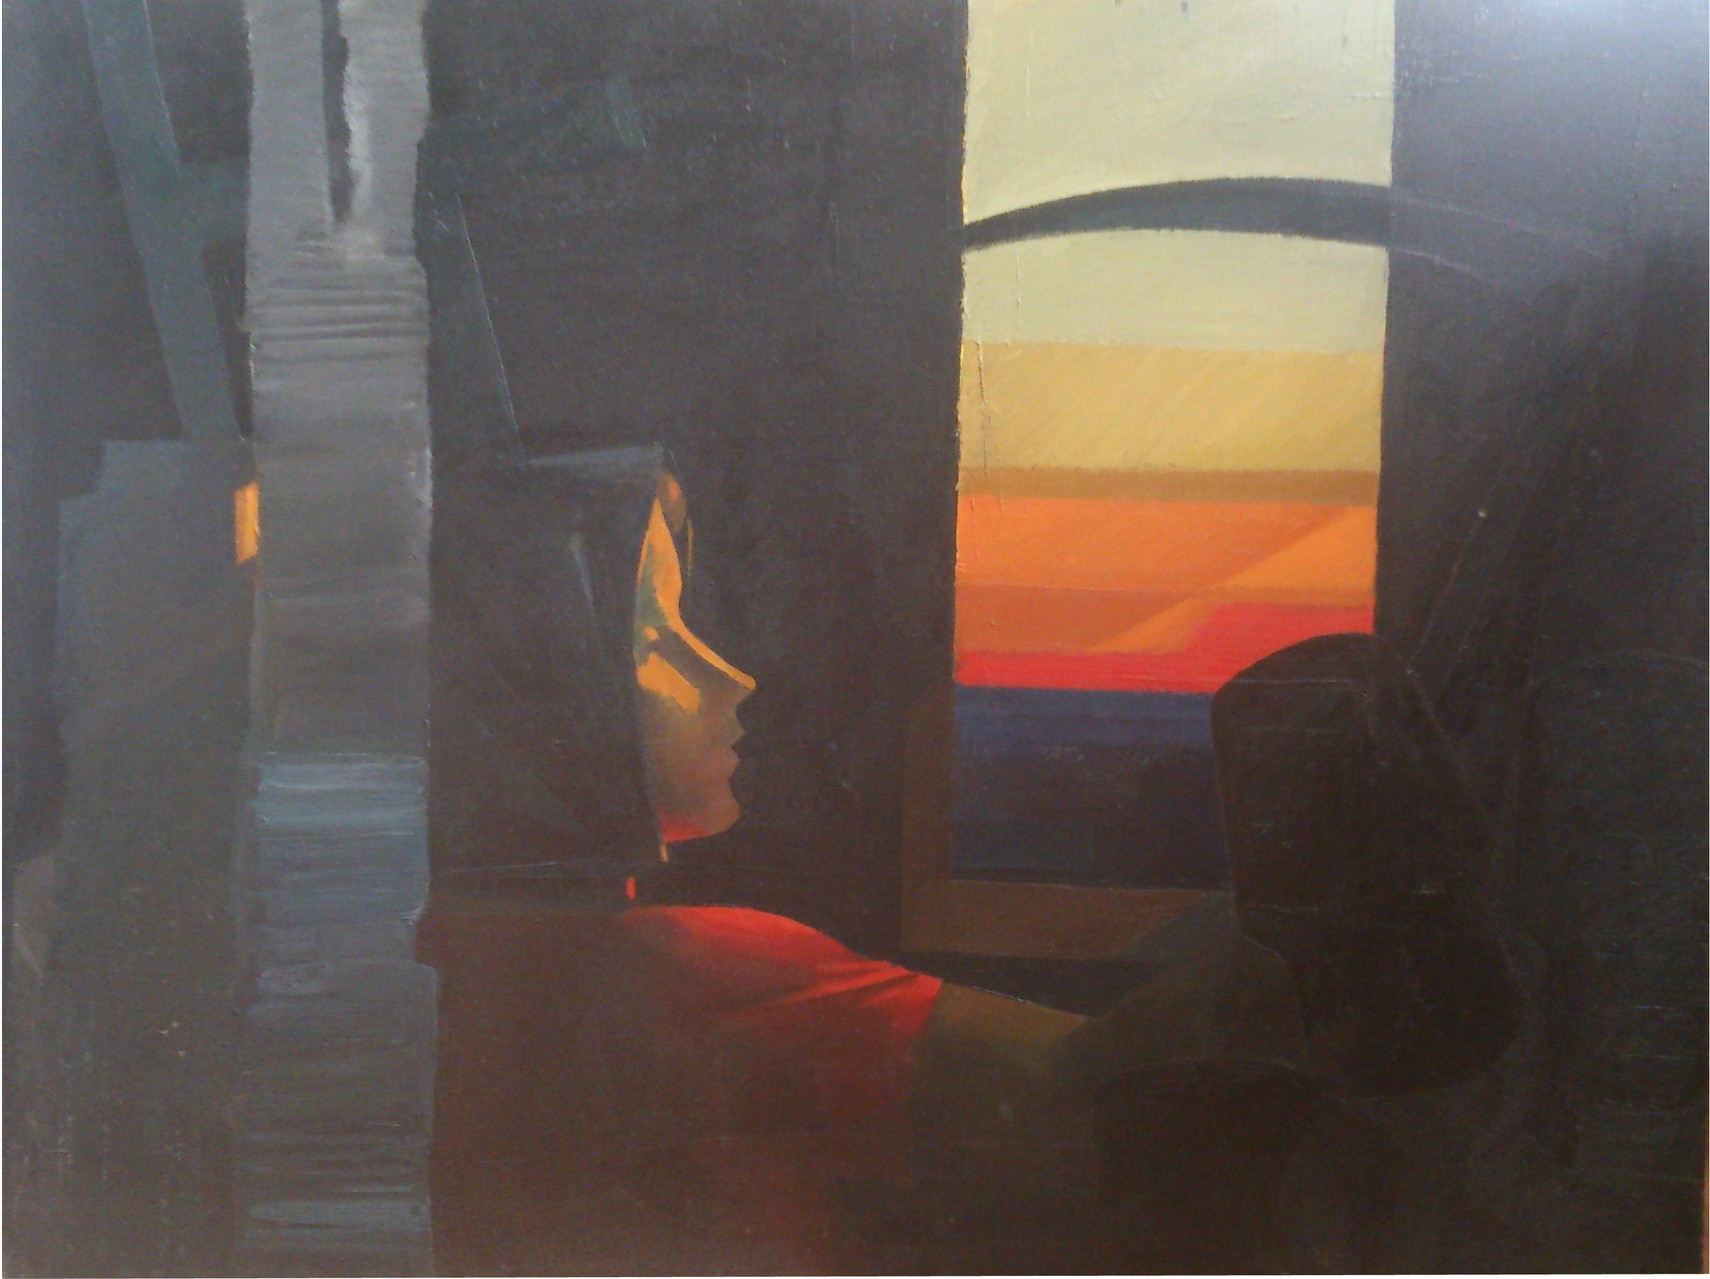 Владимир Васильевич Балясников.   Вечер.    Закат.     1982-87 г.    Холст, масло. 88х127см.